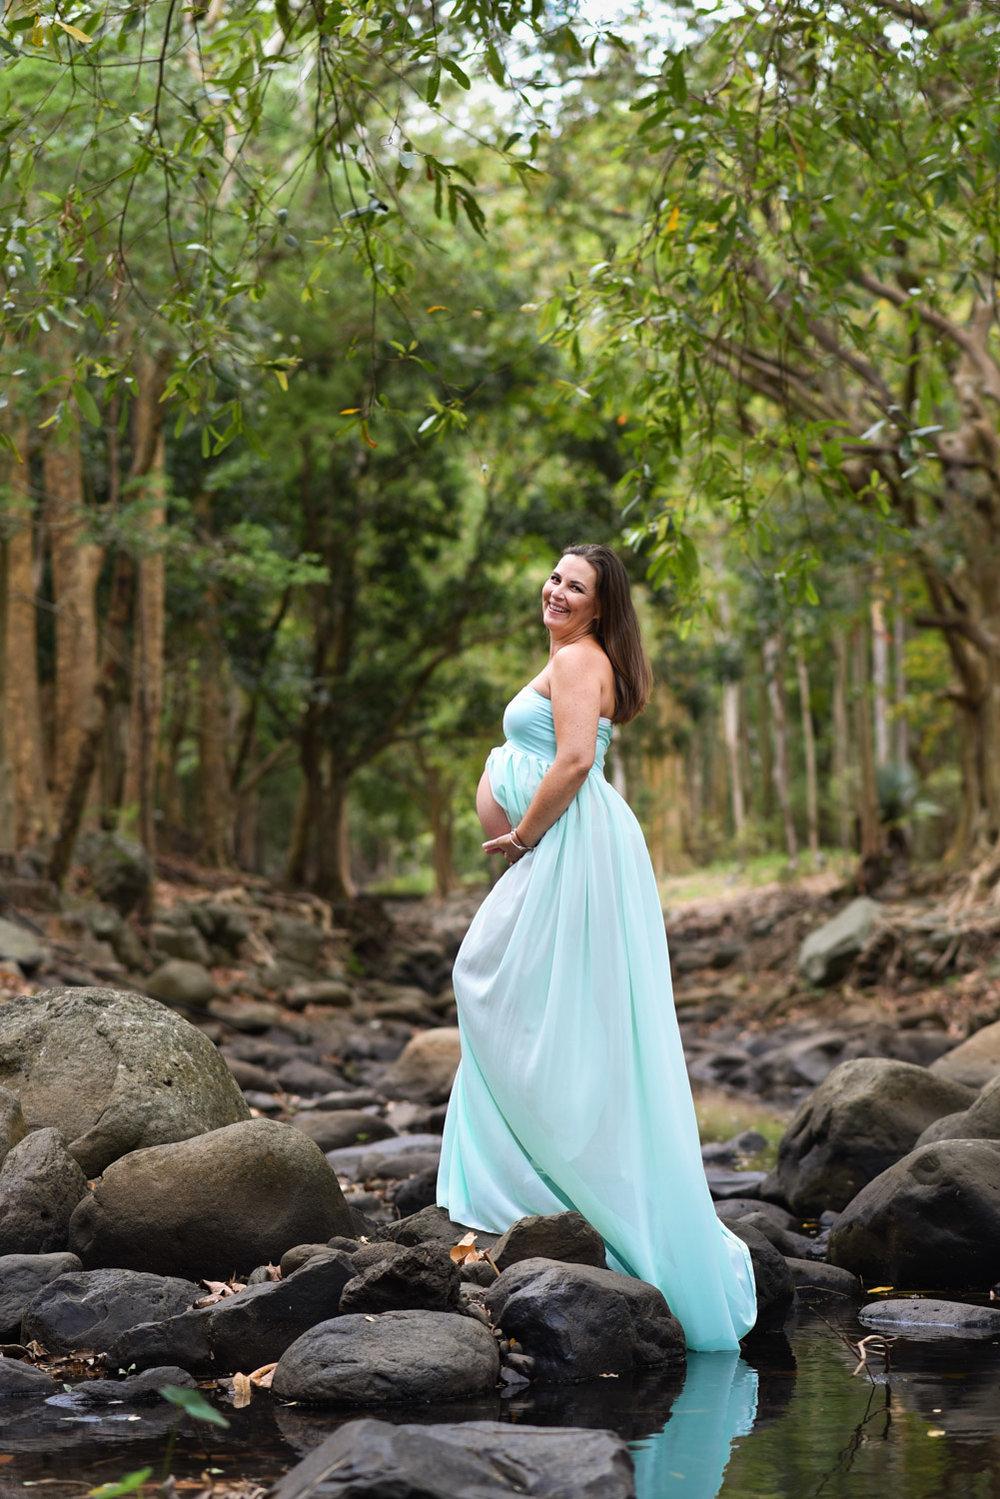 Mauritius-maternity-photography-19.jpg